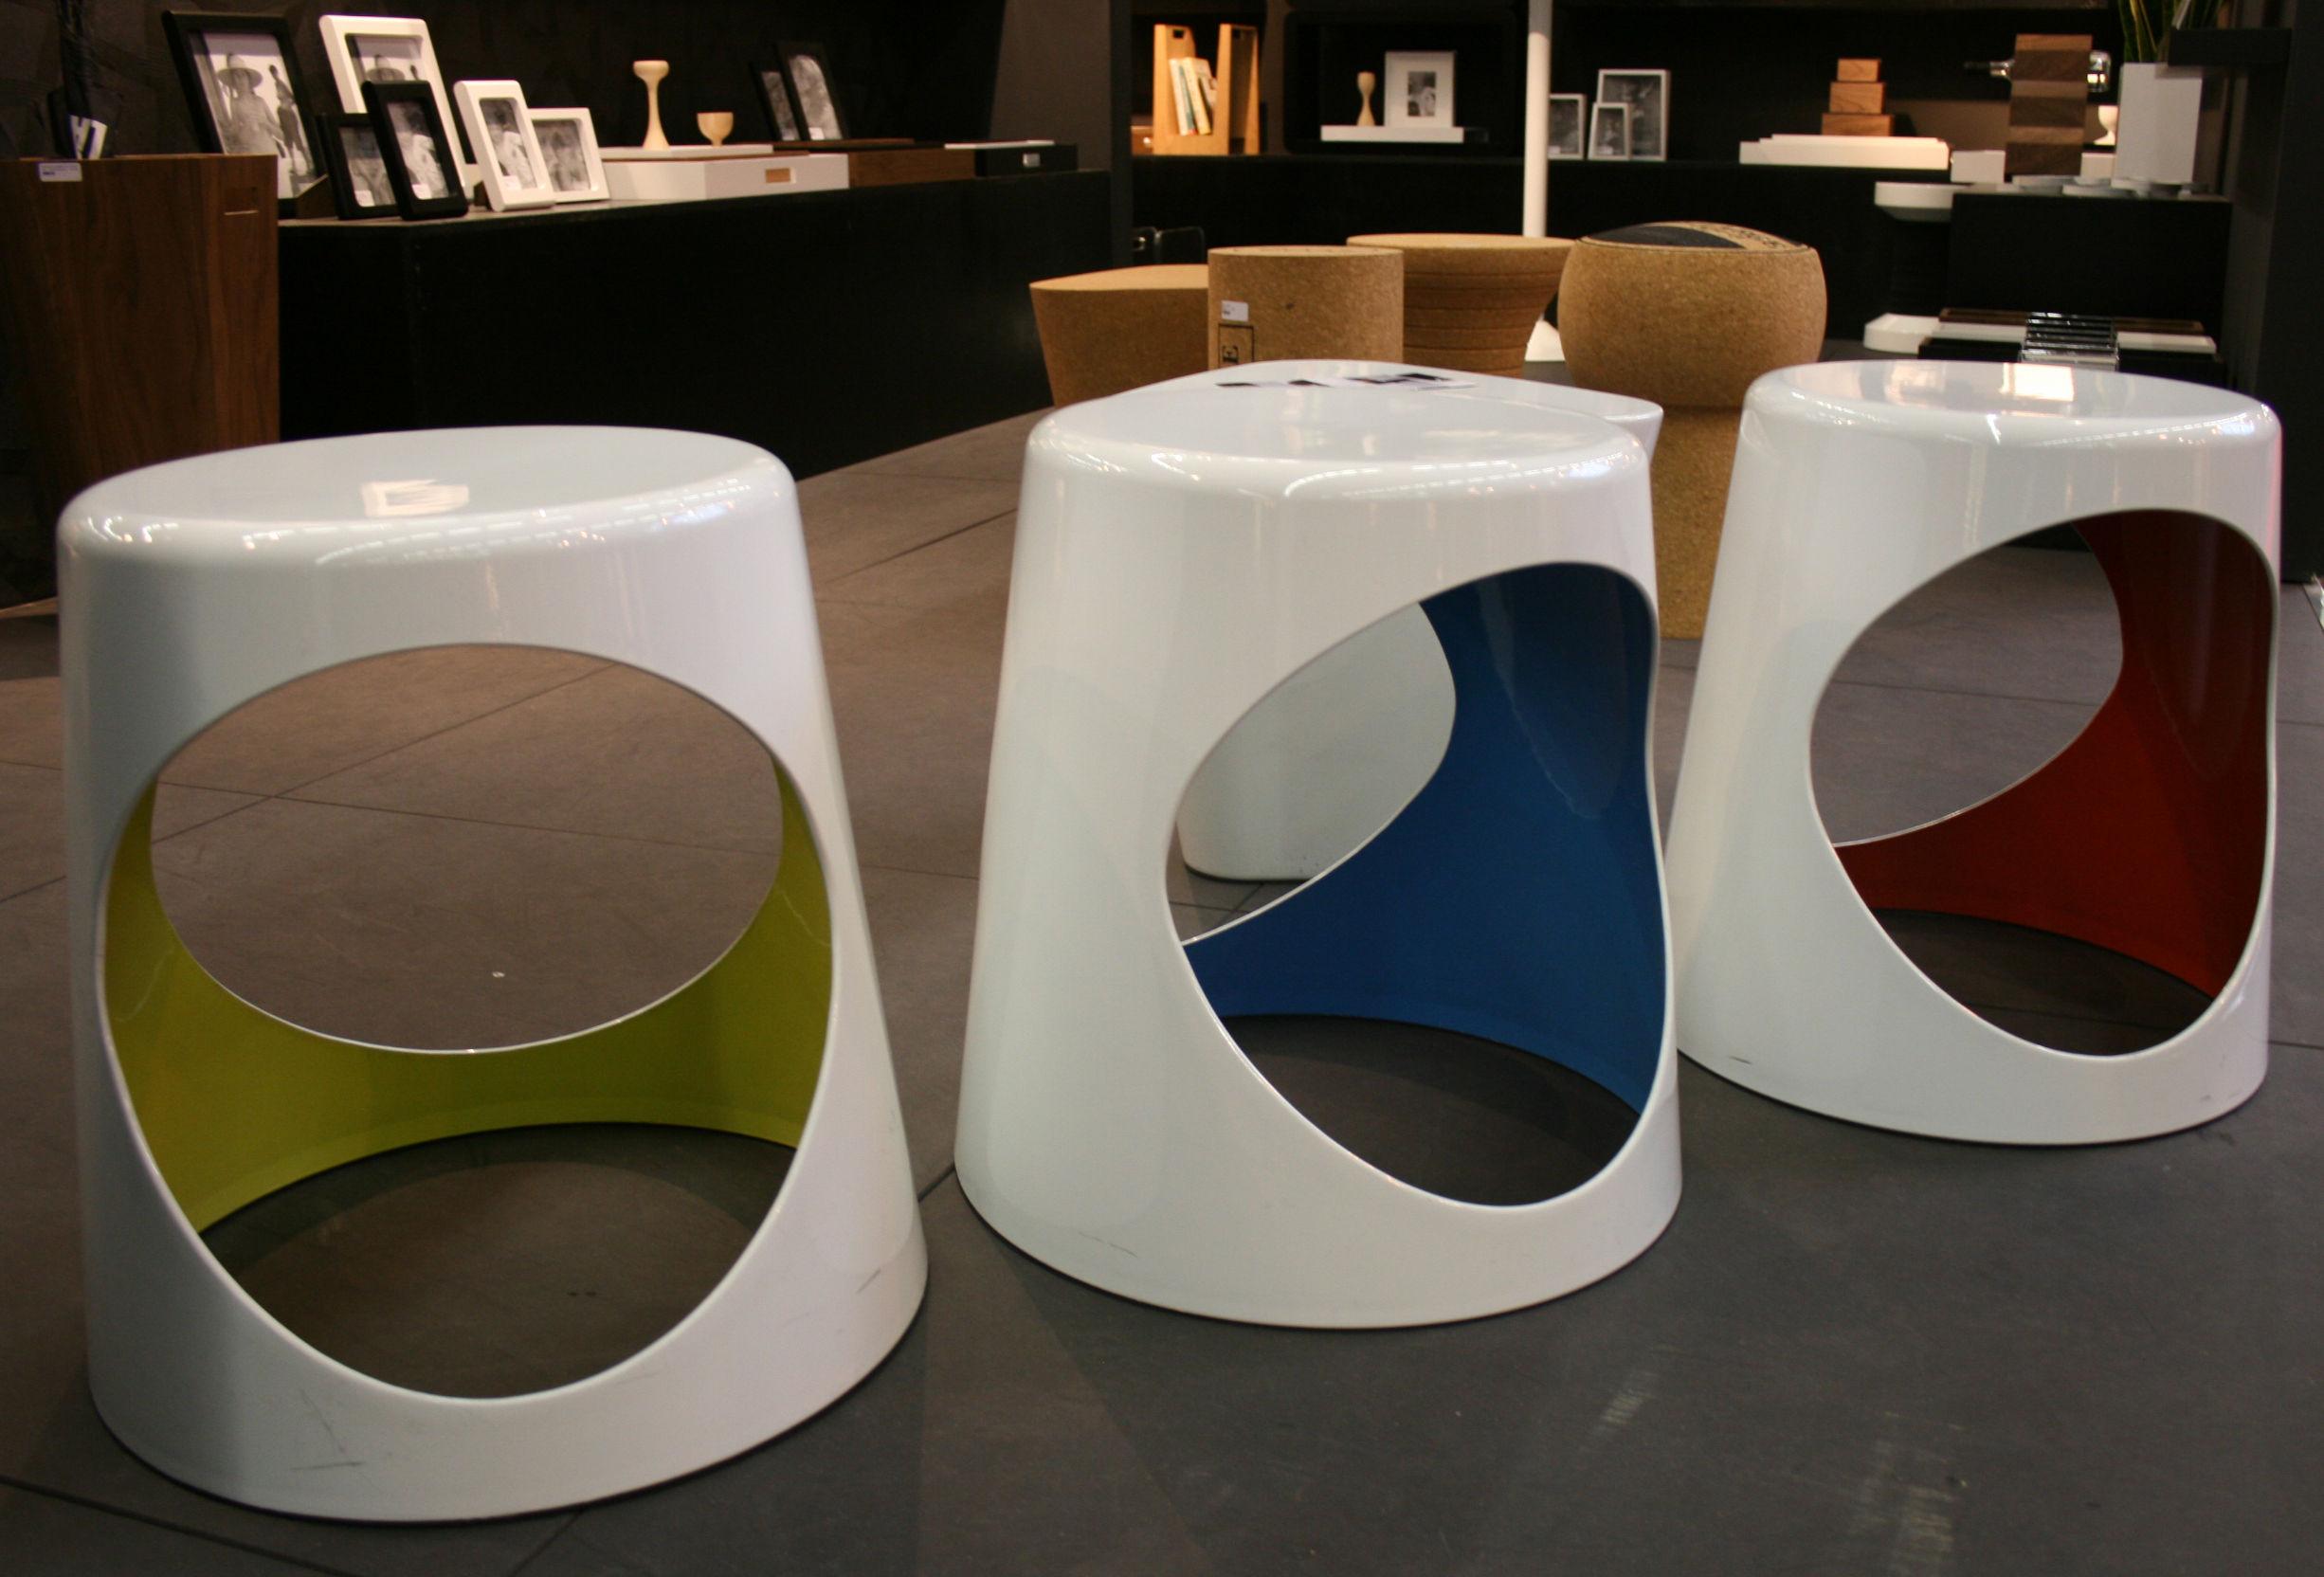 Scopri sgabellino o2 chair bianco interno blu di xl boom made in